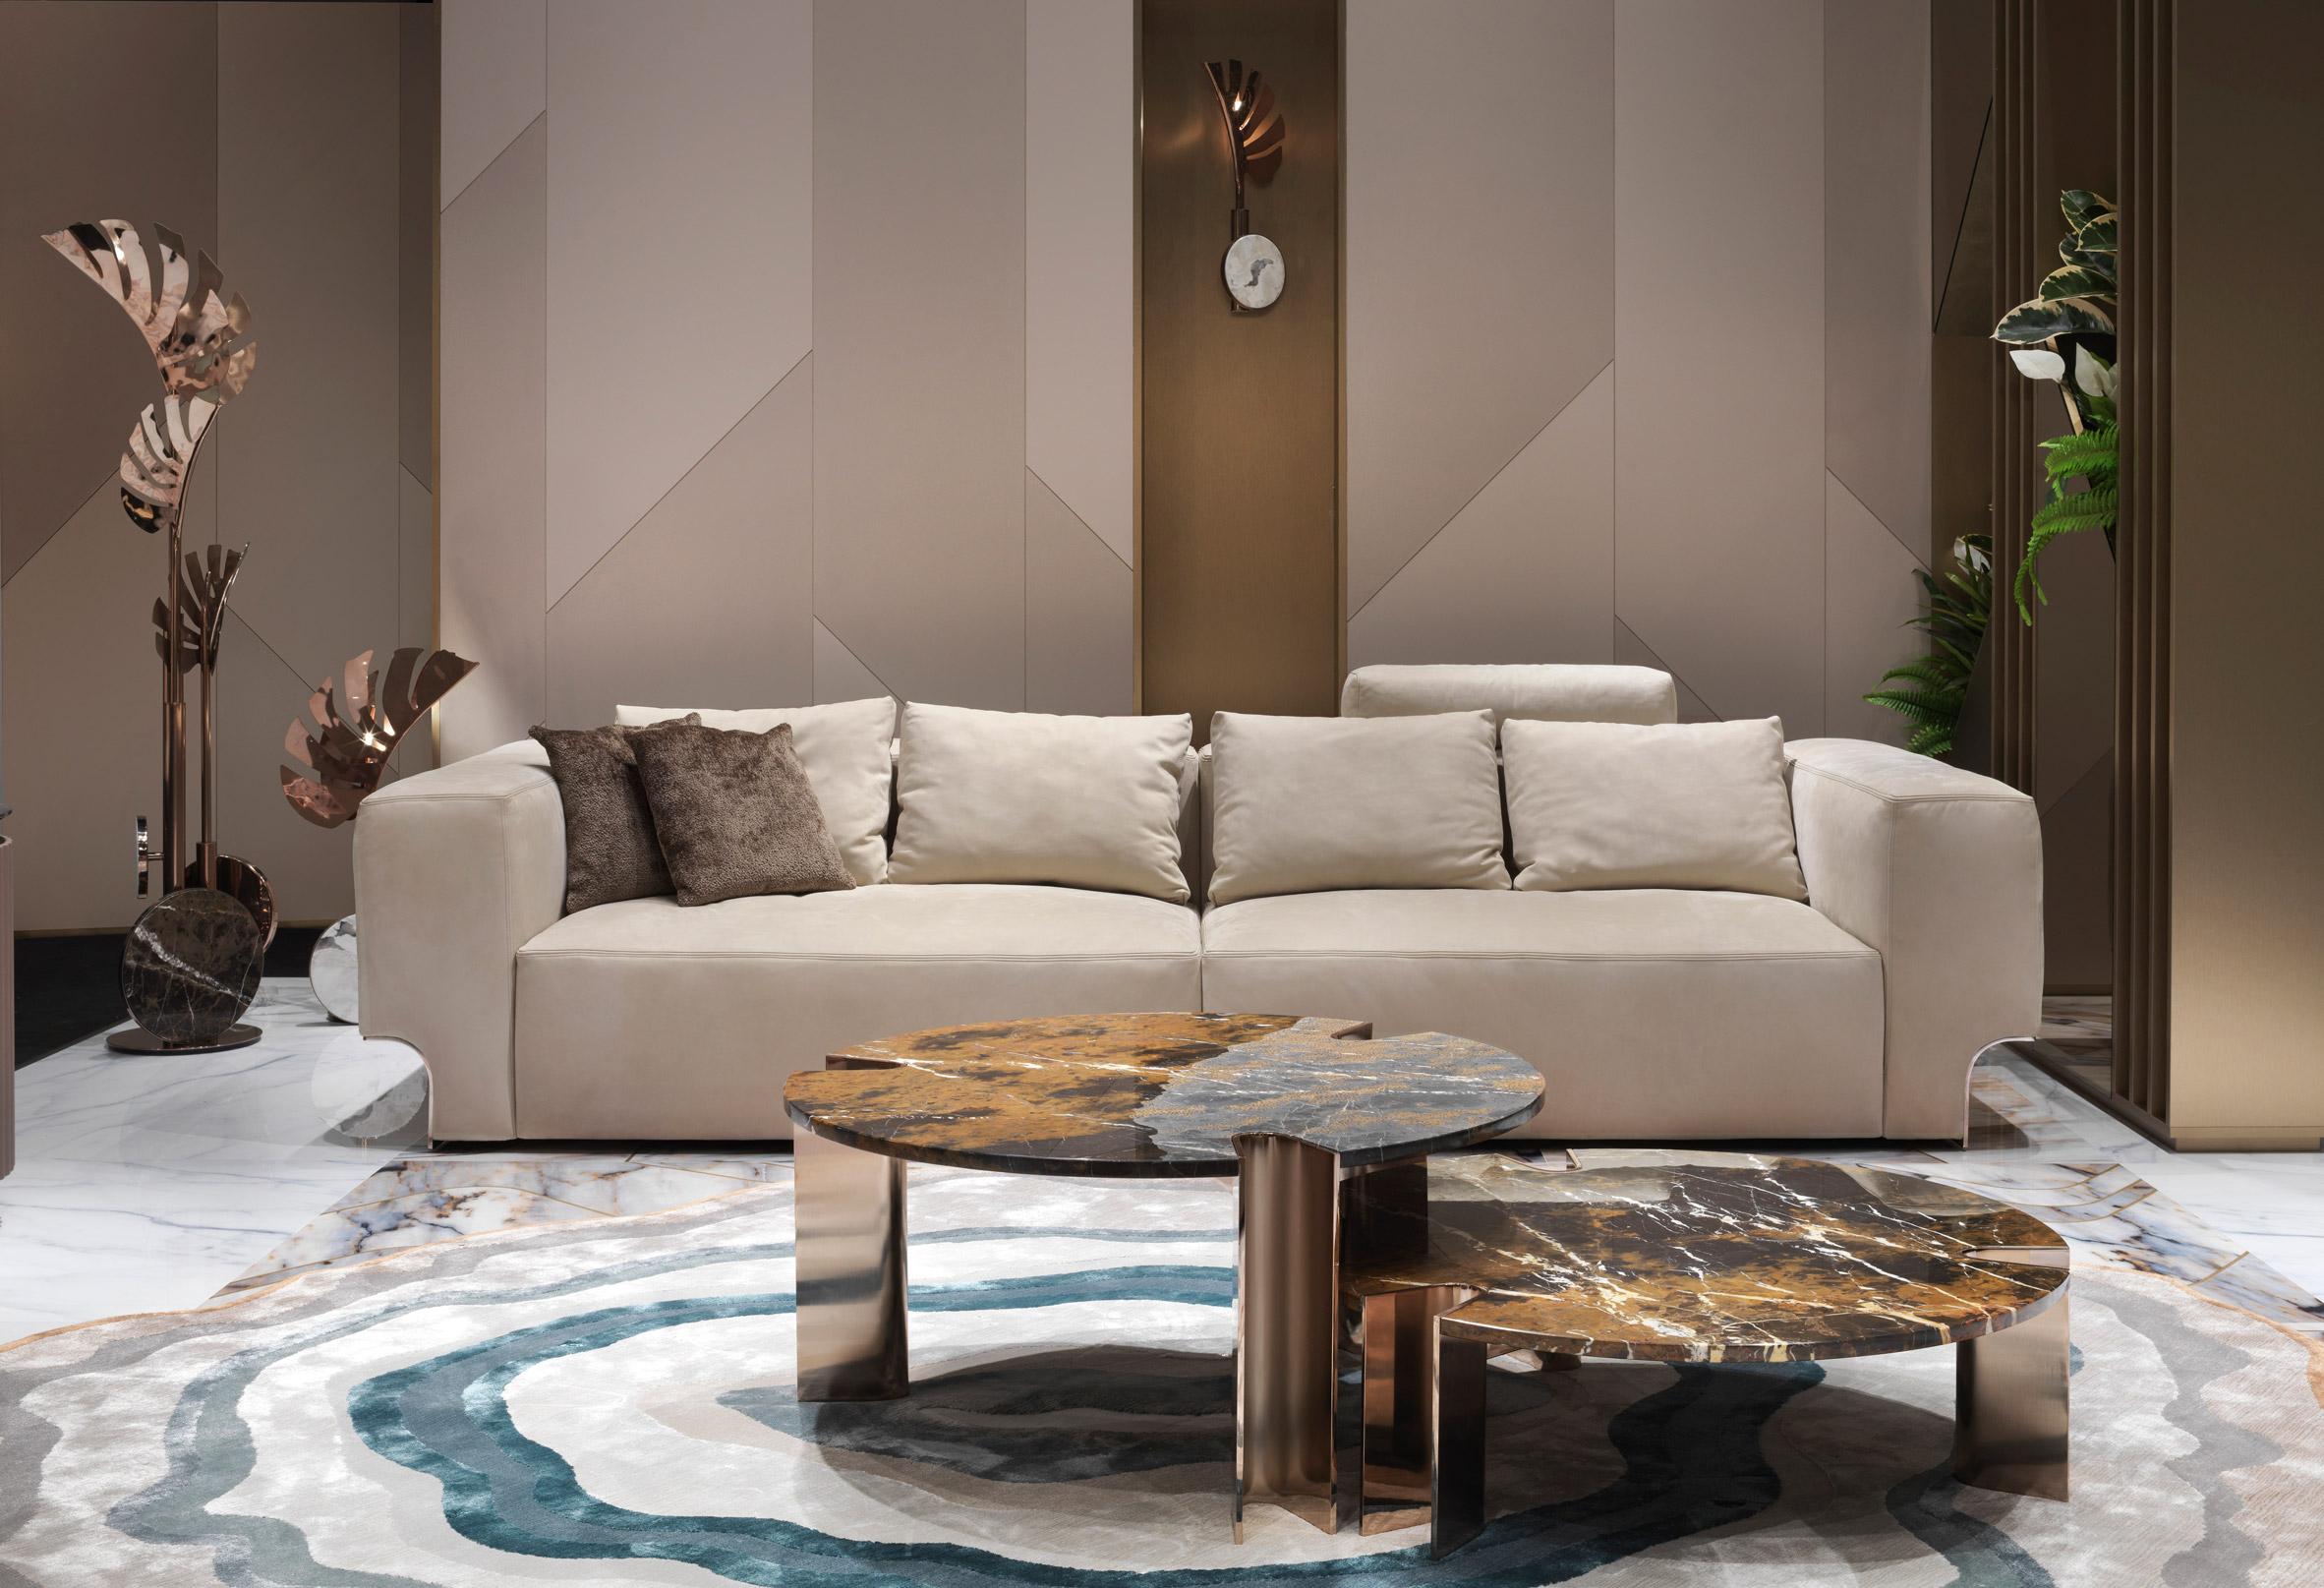 Alessandro La Spada's Douglass sofa from Visionnaire's Beauty collection